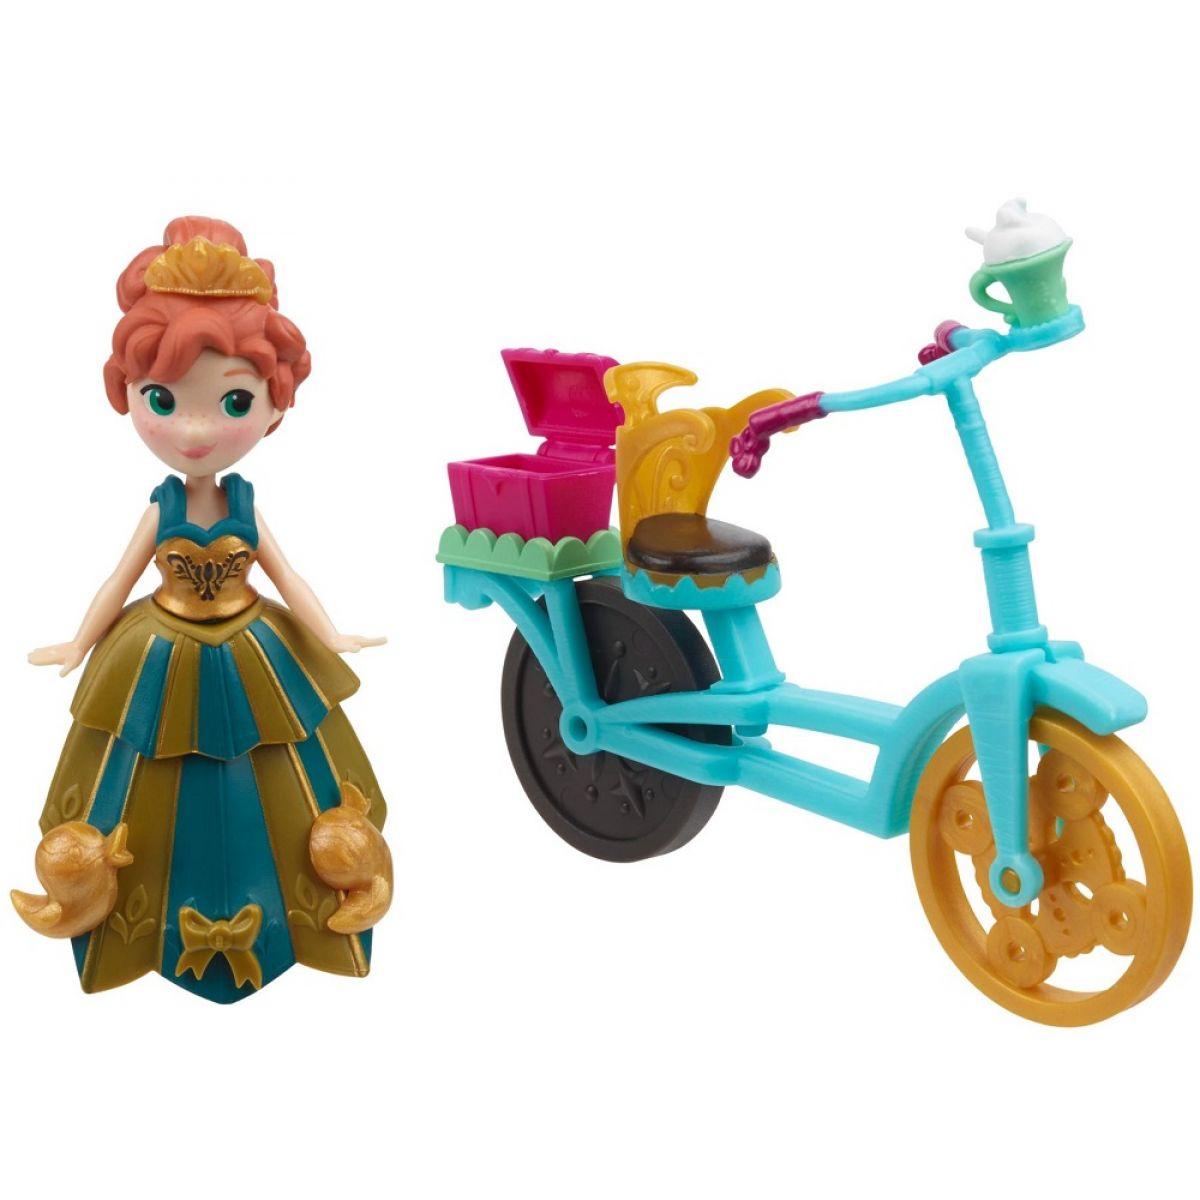 Hasbro Disney Frozen Little Kingdom Mini panenka s doplňky - Anna & Bicycle